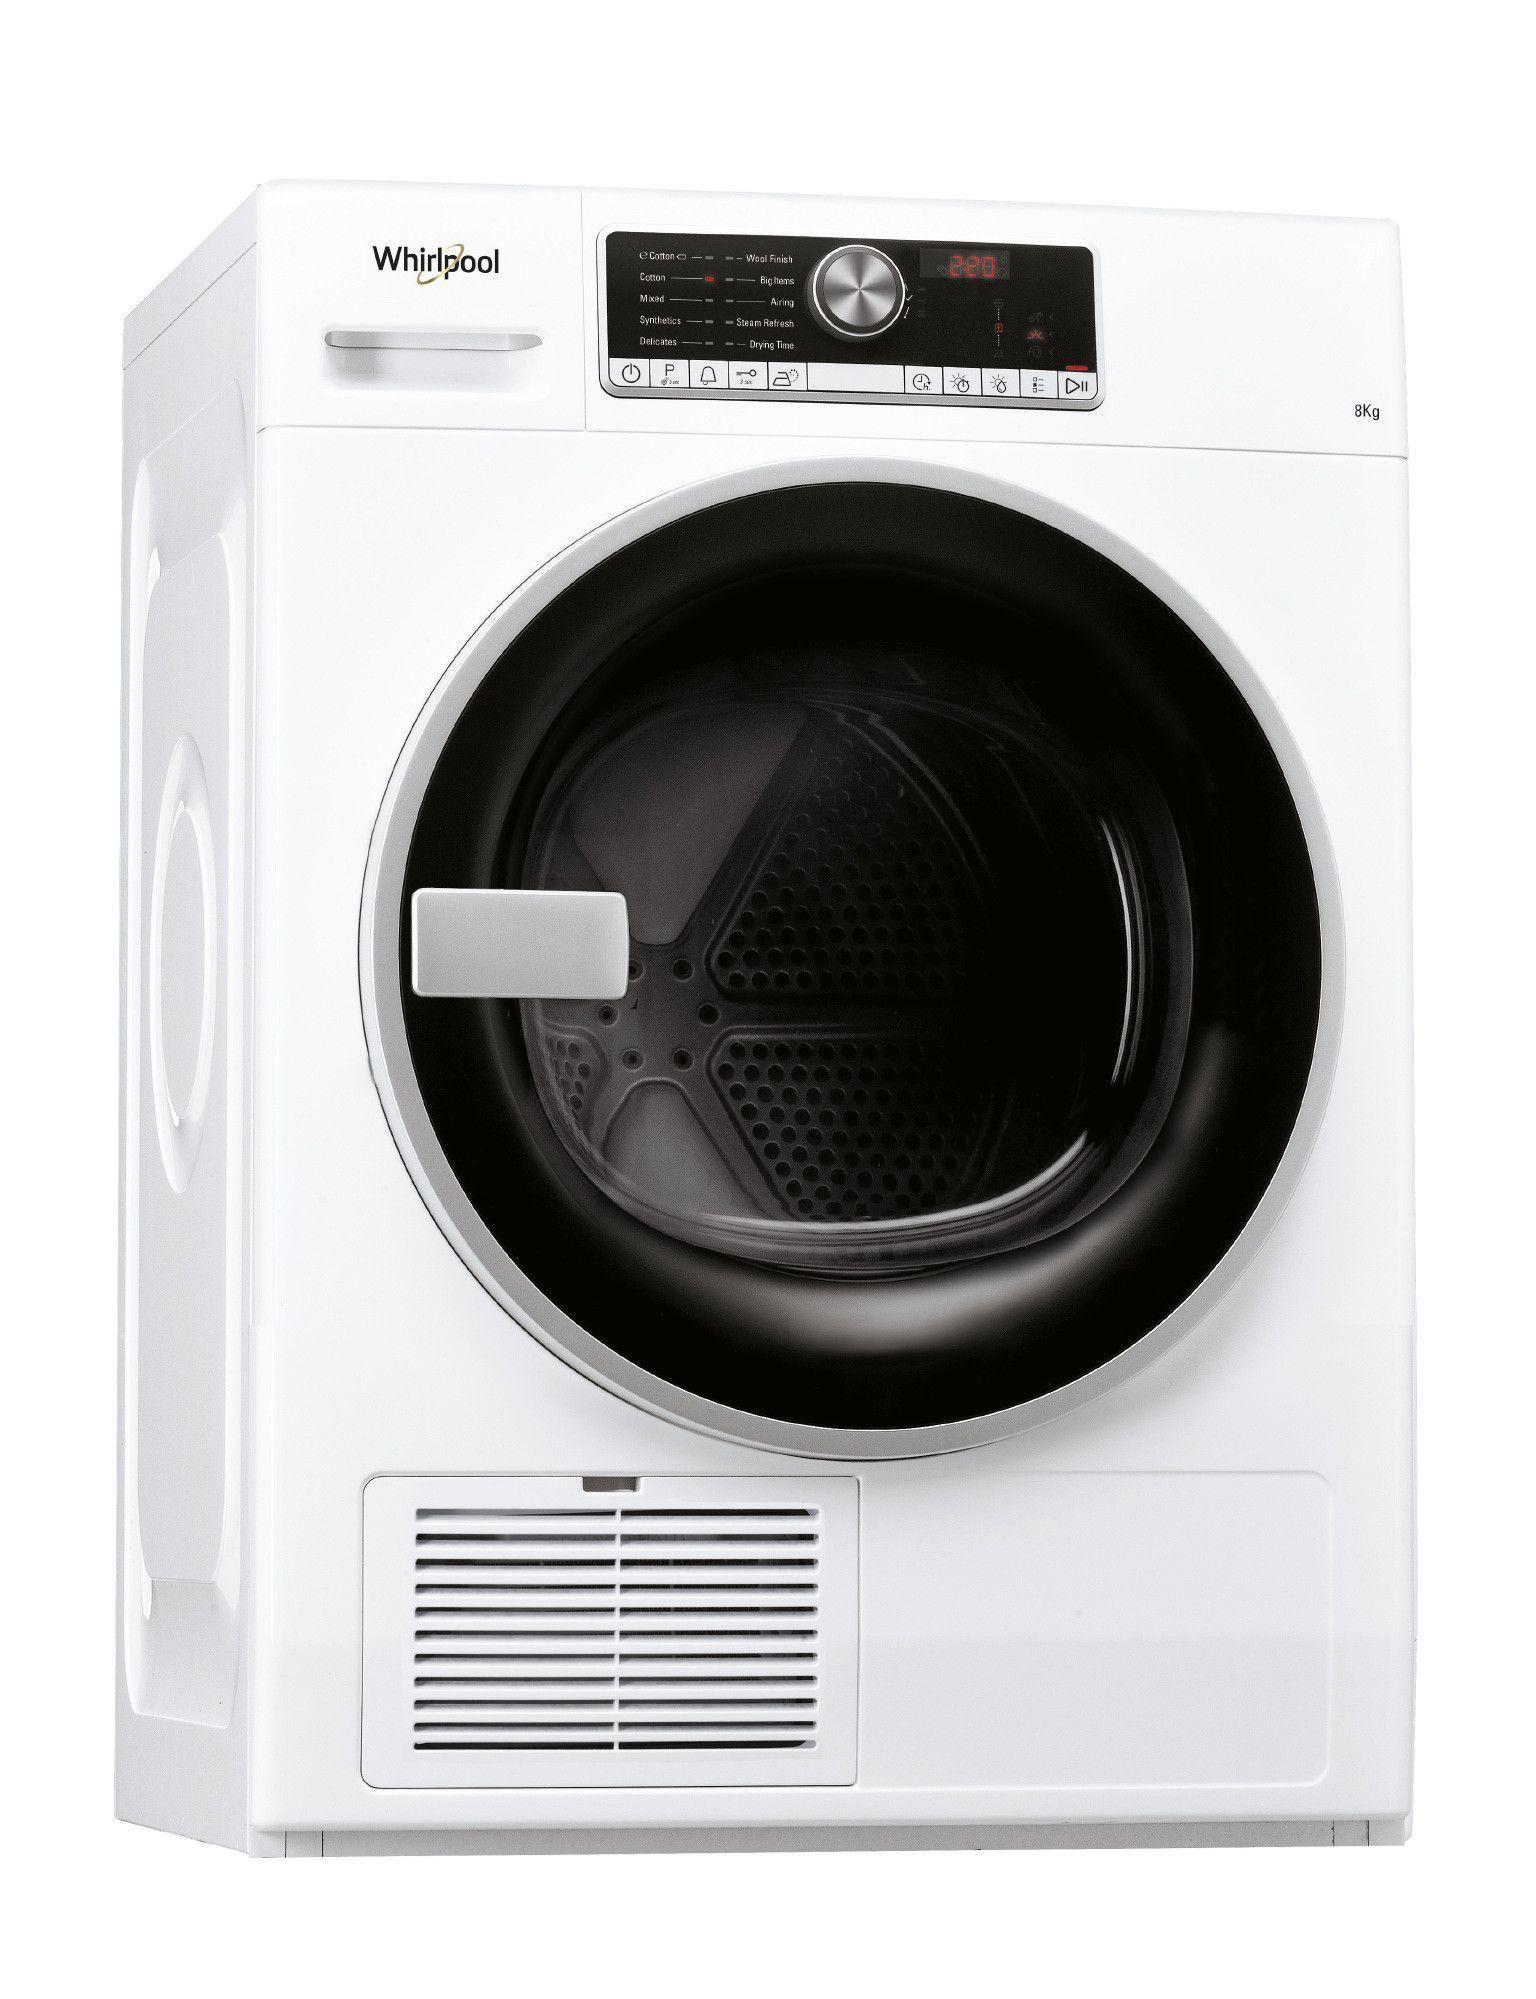 Idea By Jose On Laundry Business Laundry Equipment Laundry